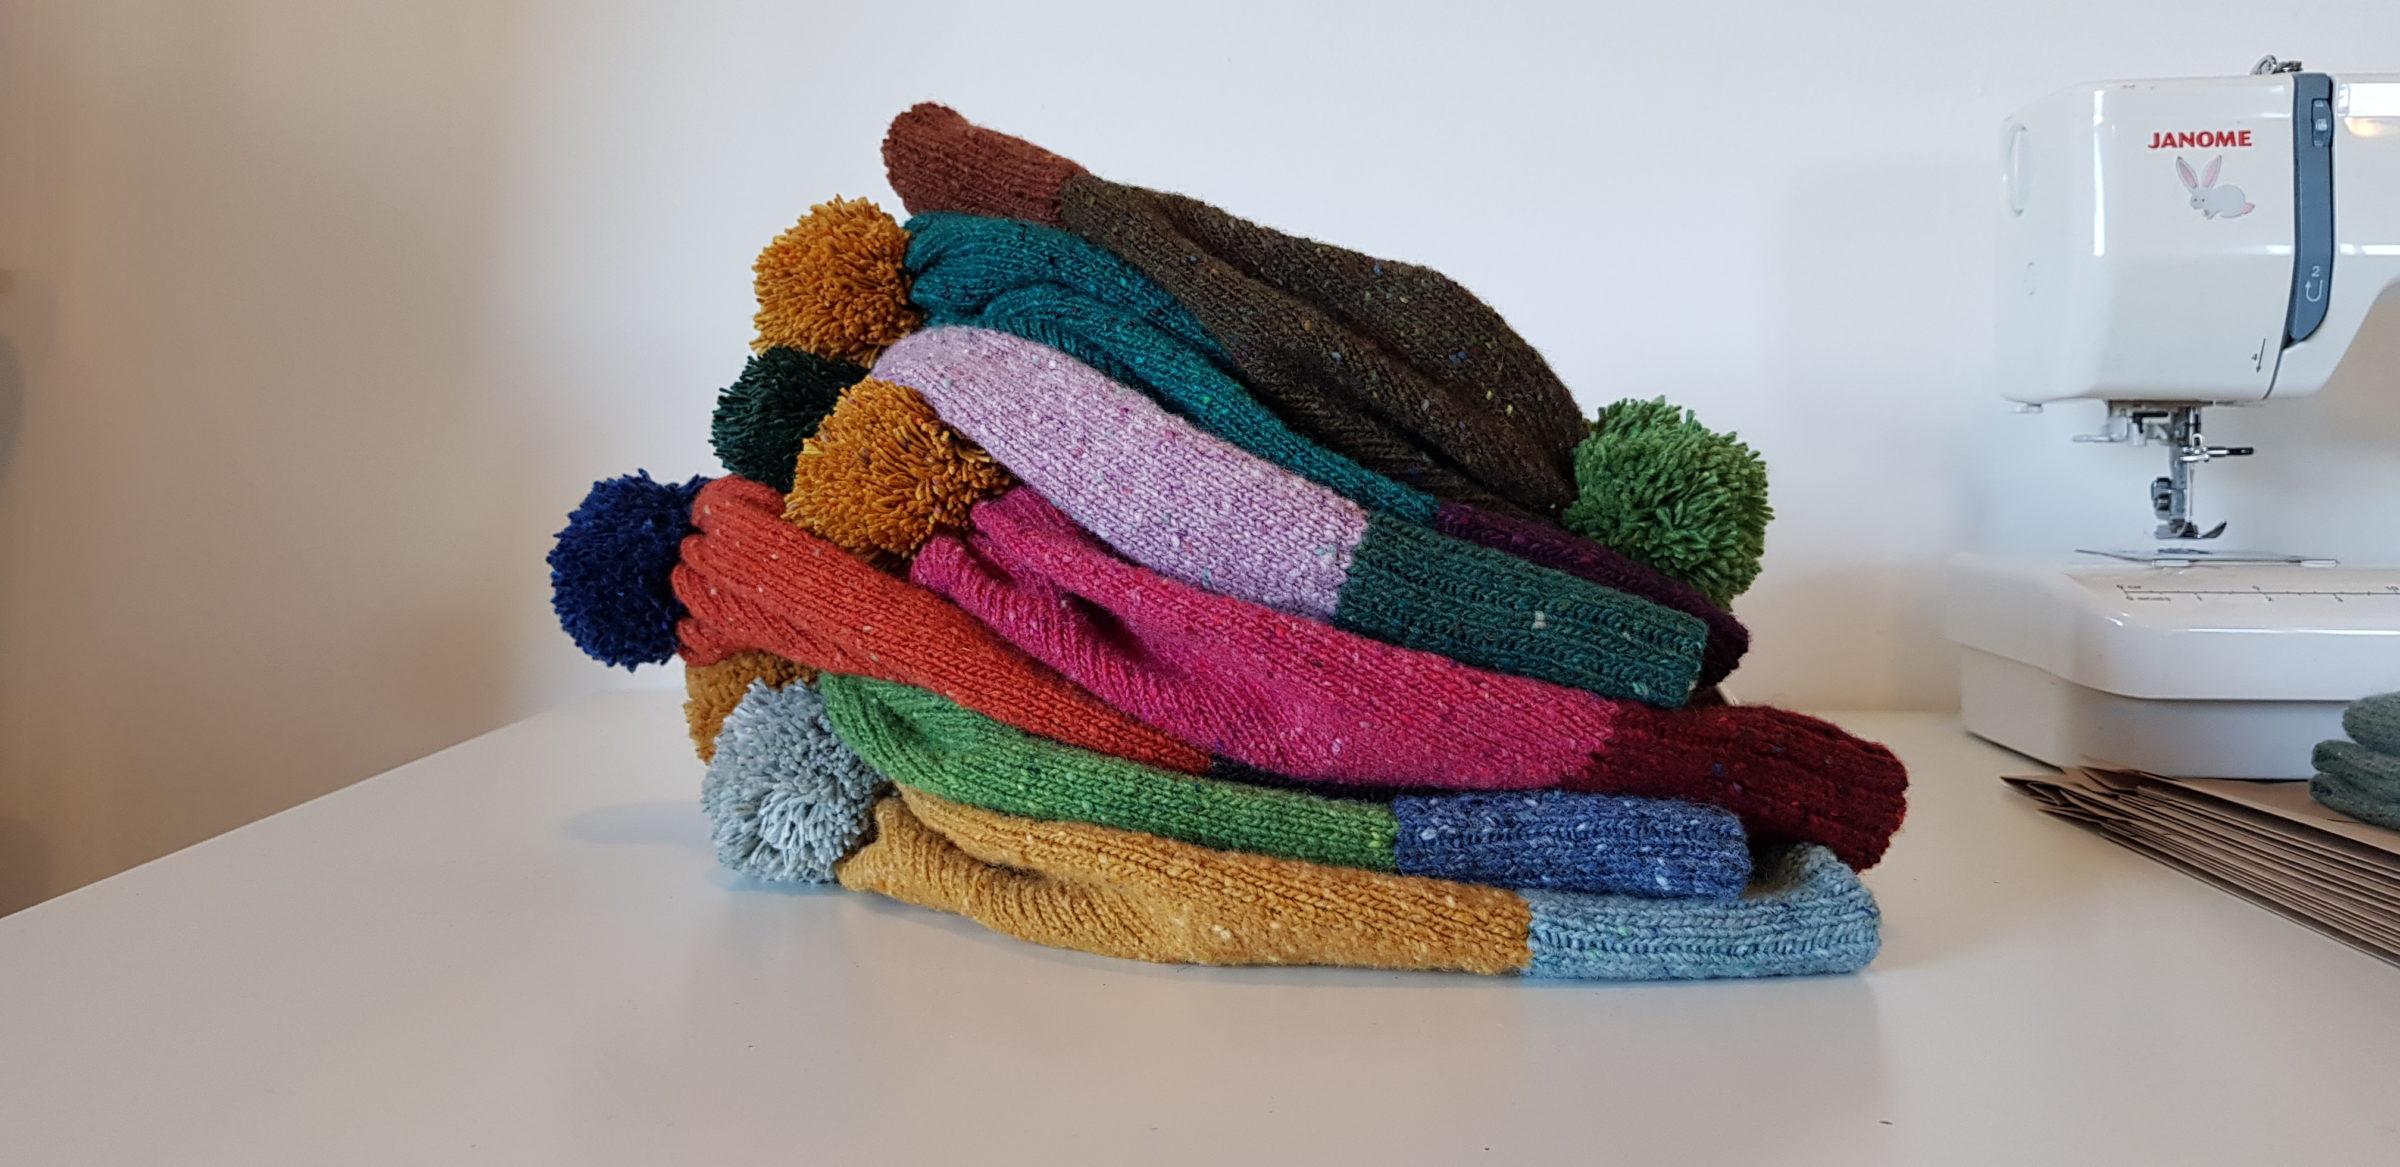 Merino wool Hats - Donegal Yarns_Liadain Aiken